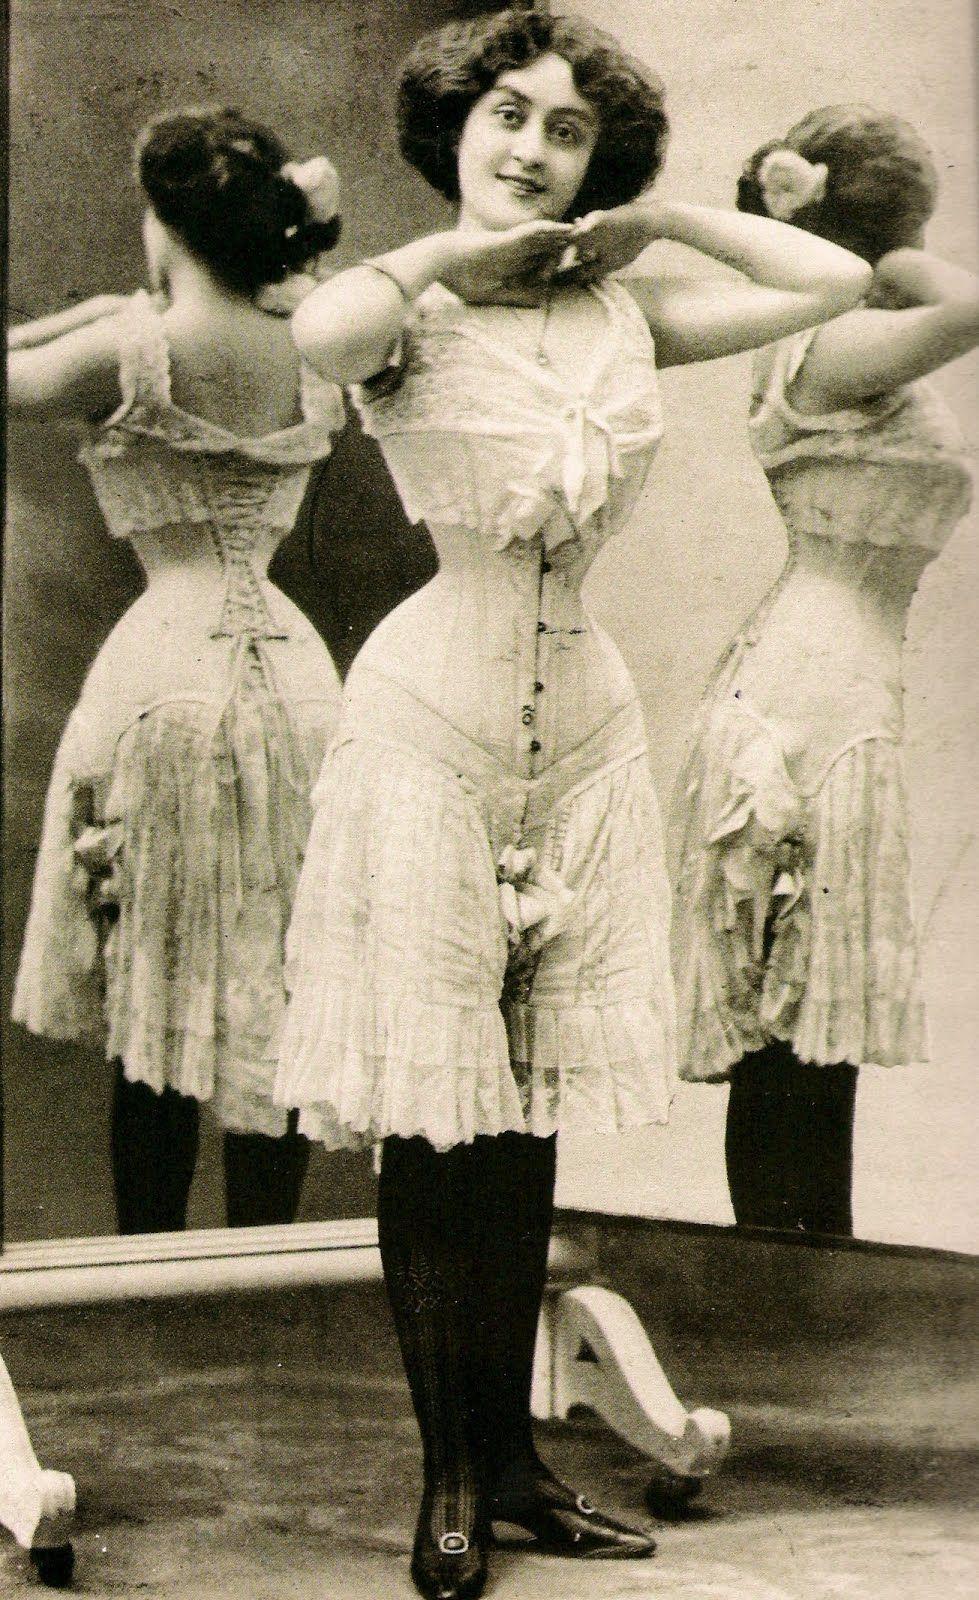 ff883750be9 Edwardian S-shaped corset – inspiration